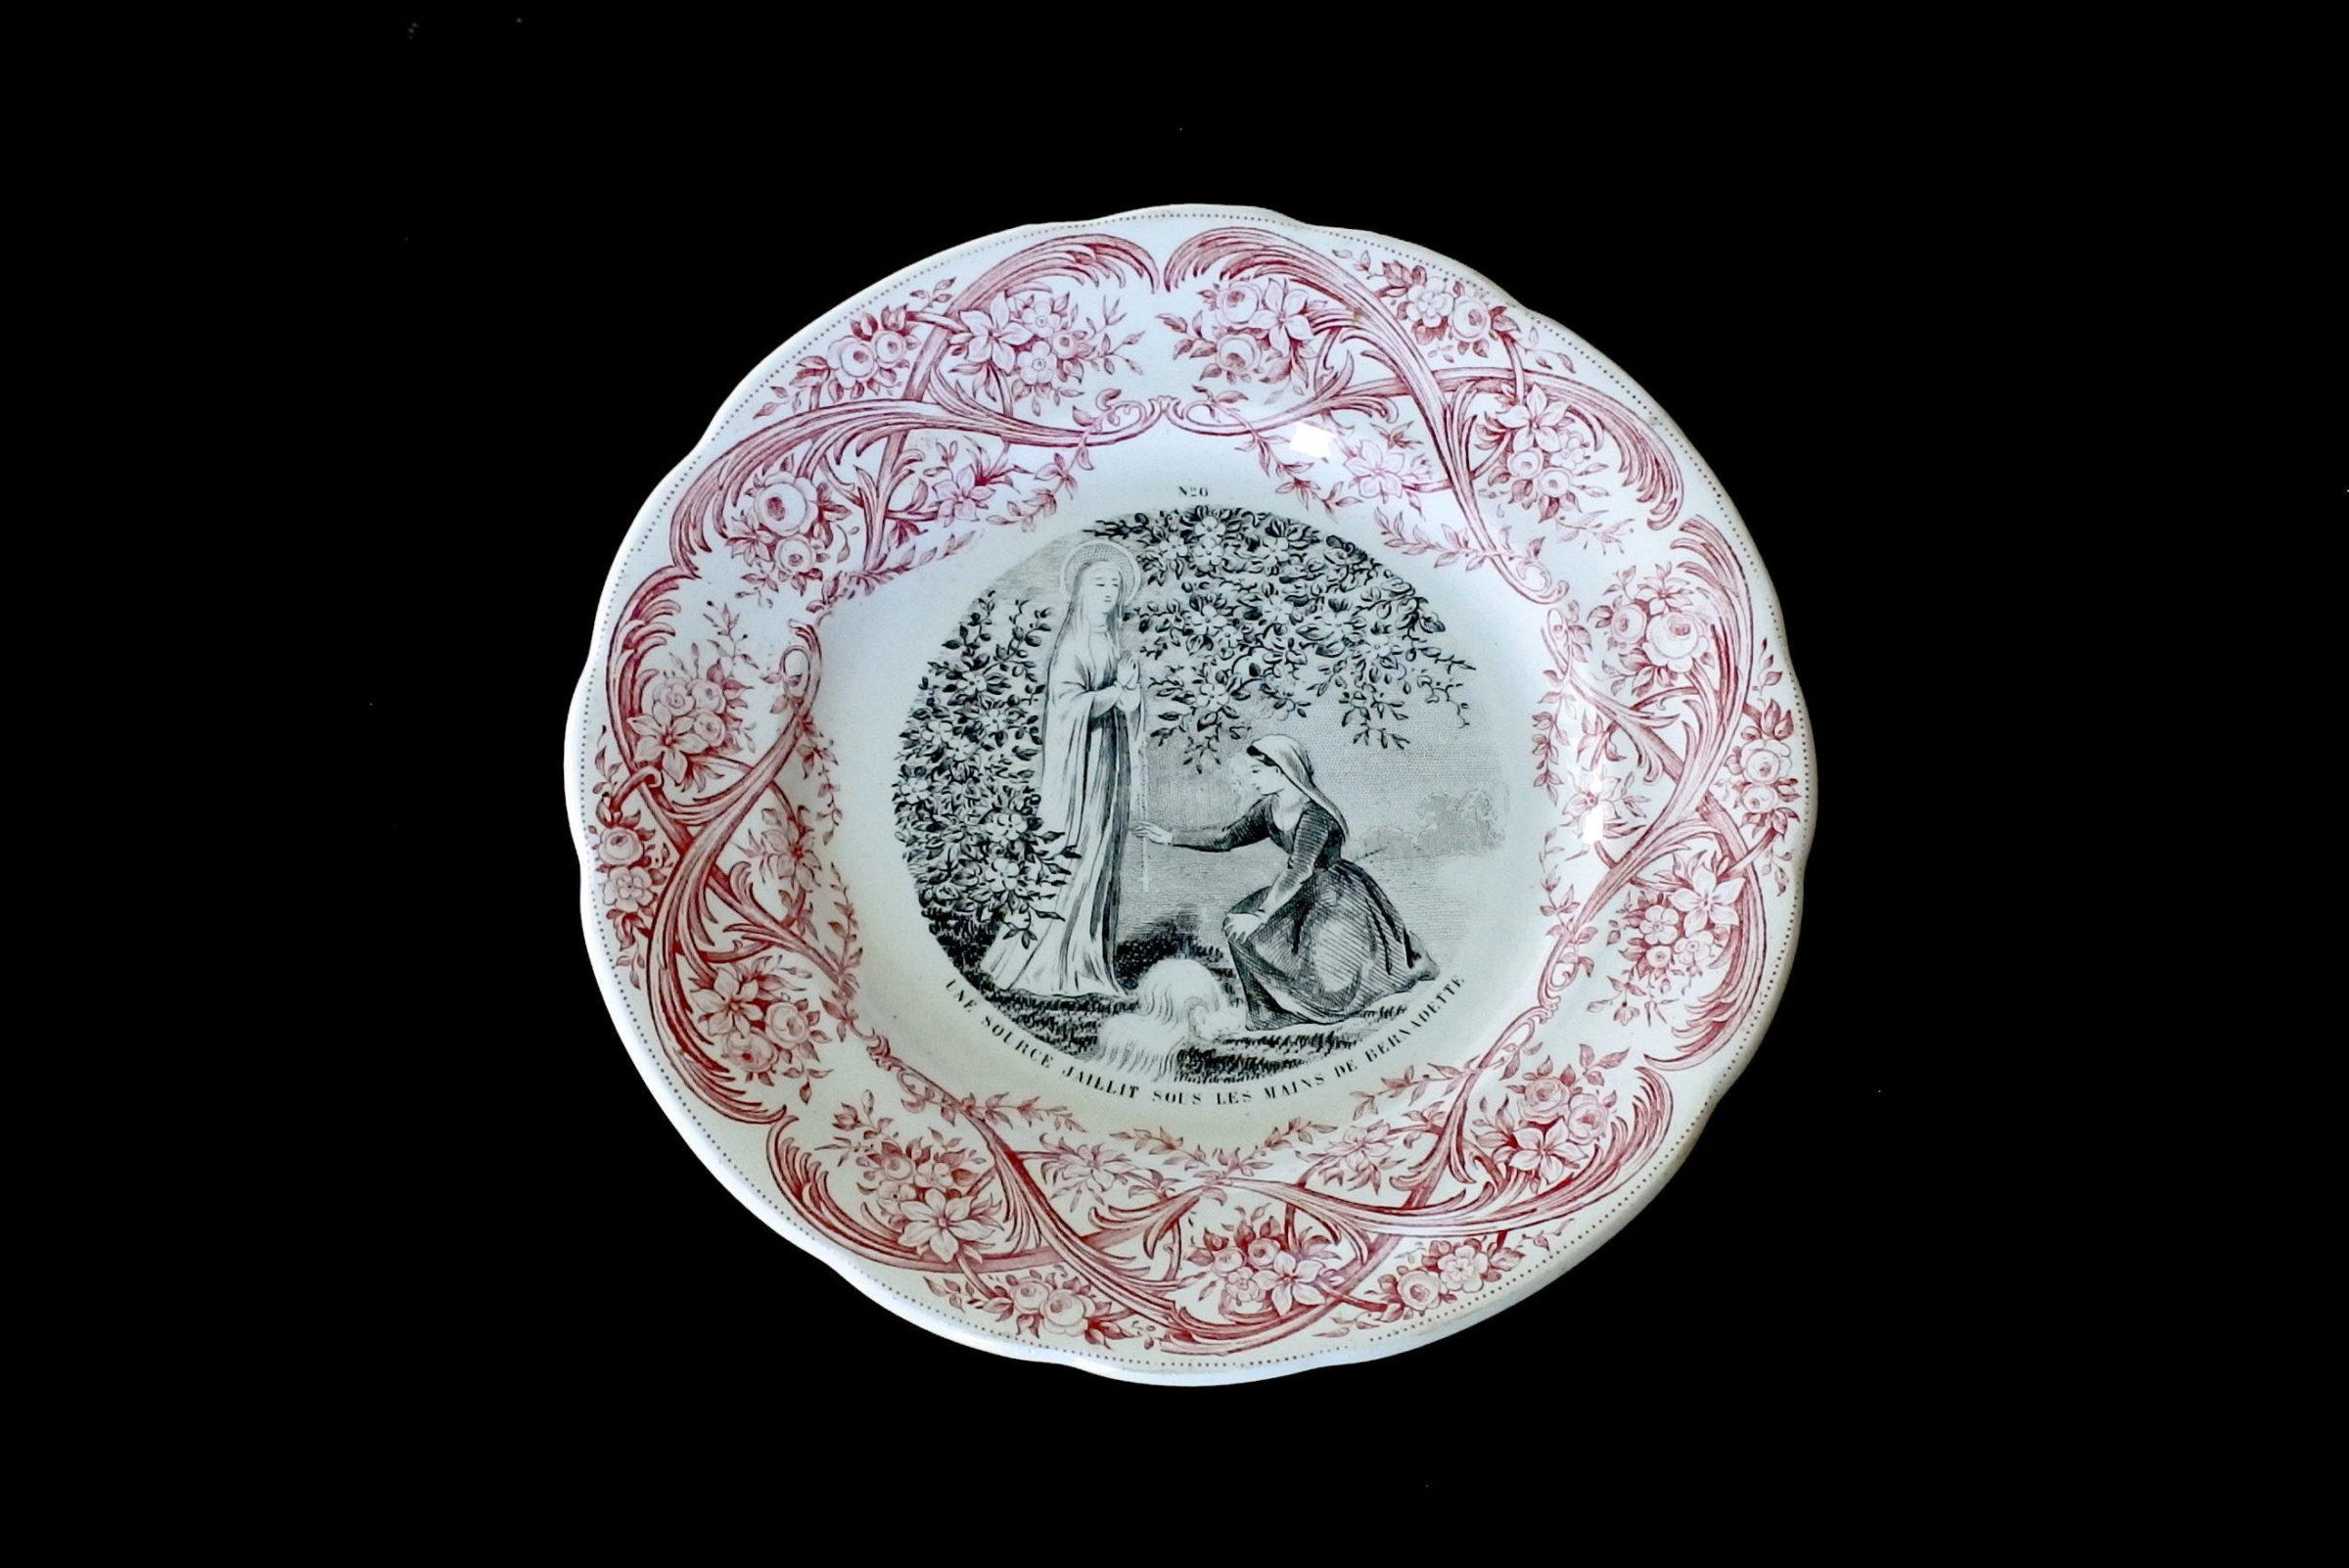 Serie completa di 12 piatti in ceramica dedicati alla vita di Bernadette - 7